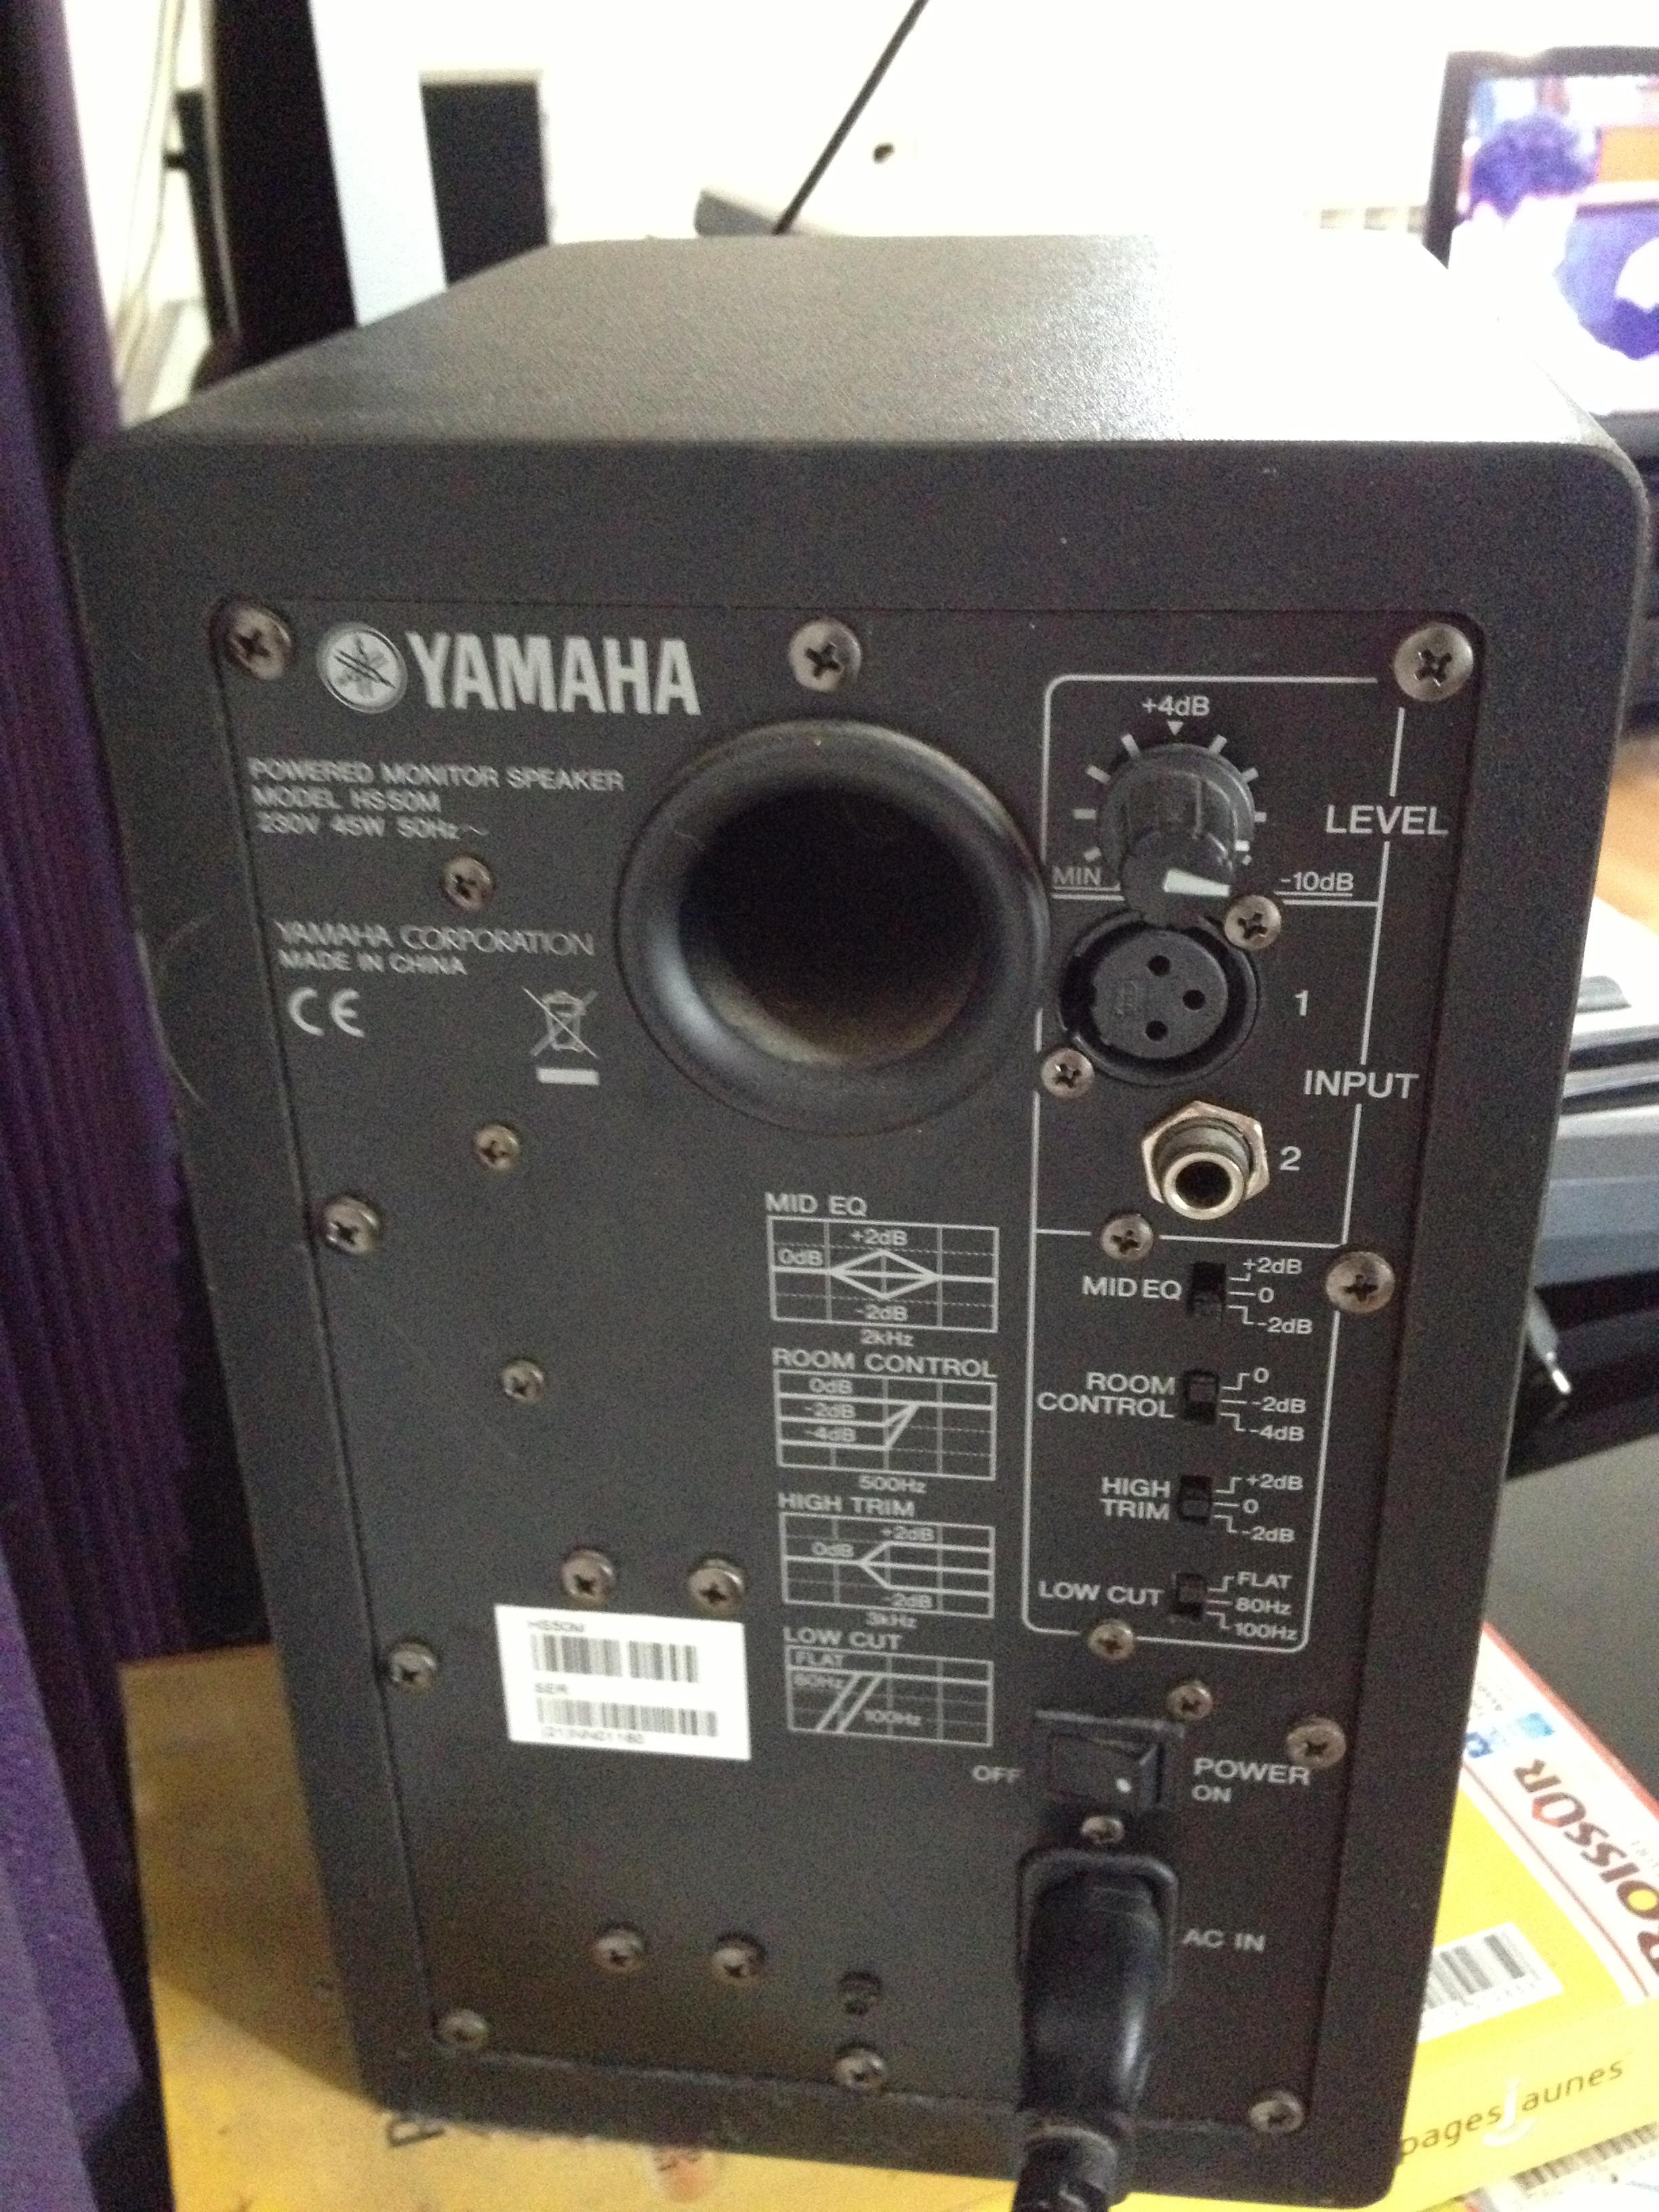 Yamaha hs50m image 480697 audiofanzine for Yamaha hs50m review